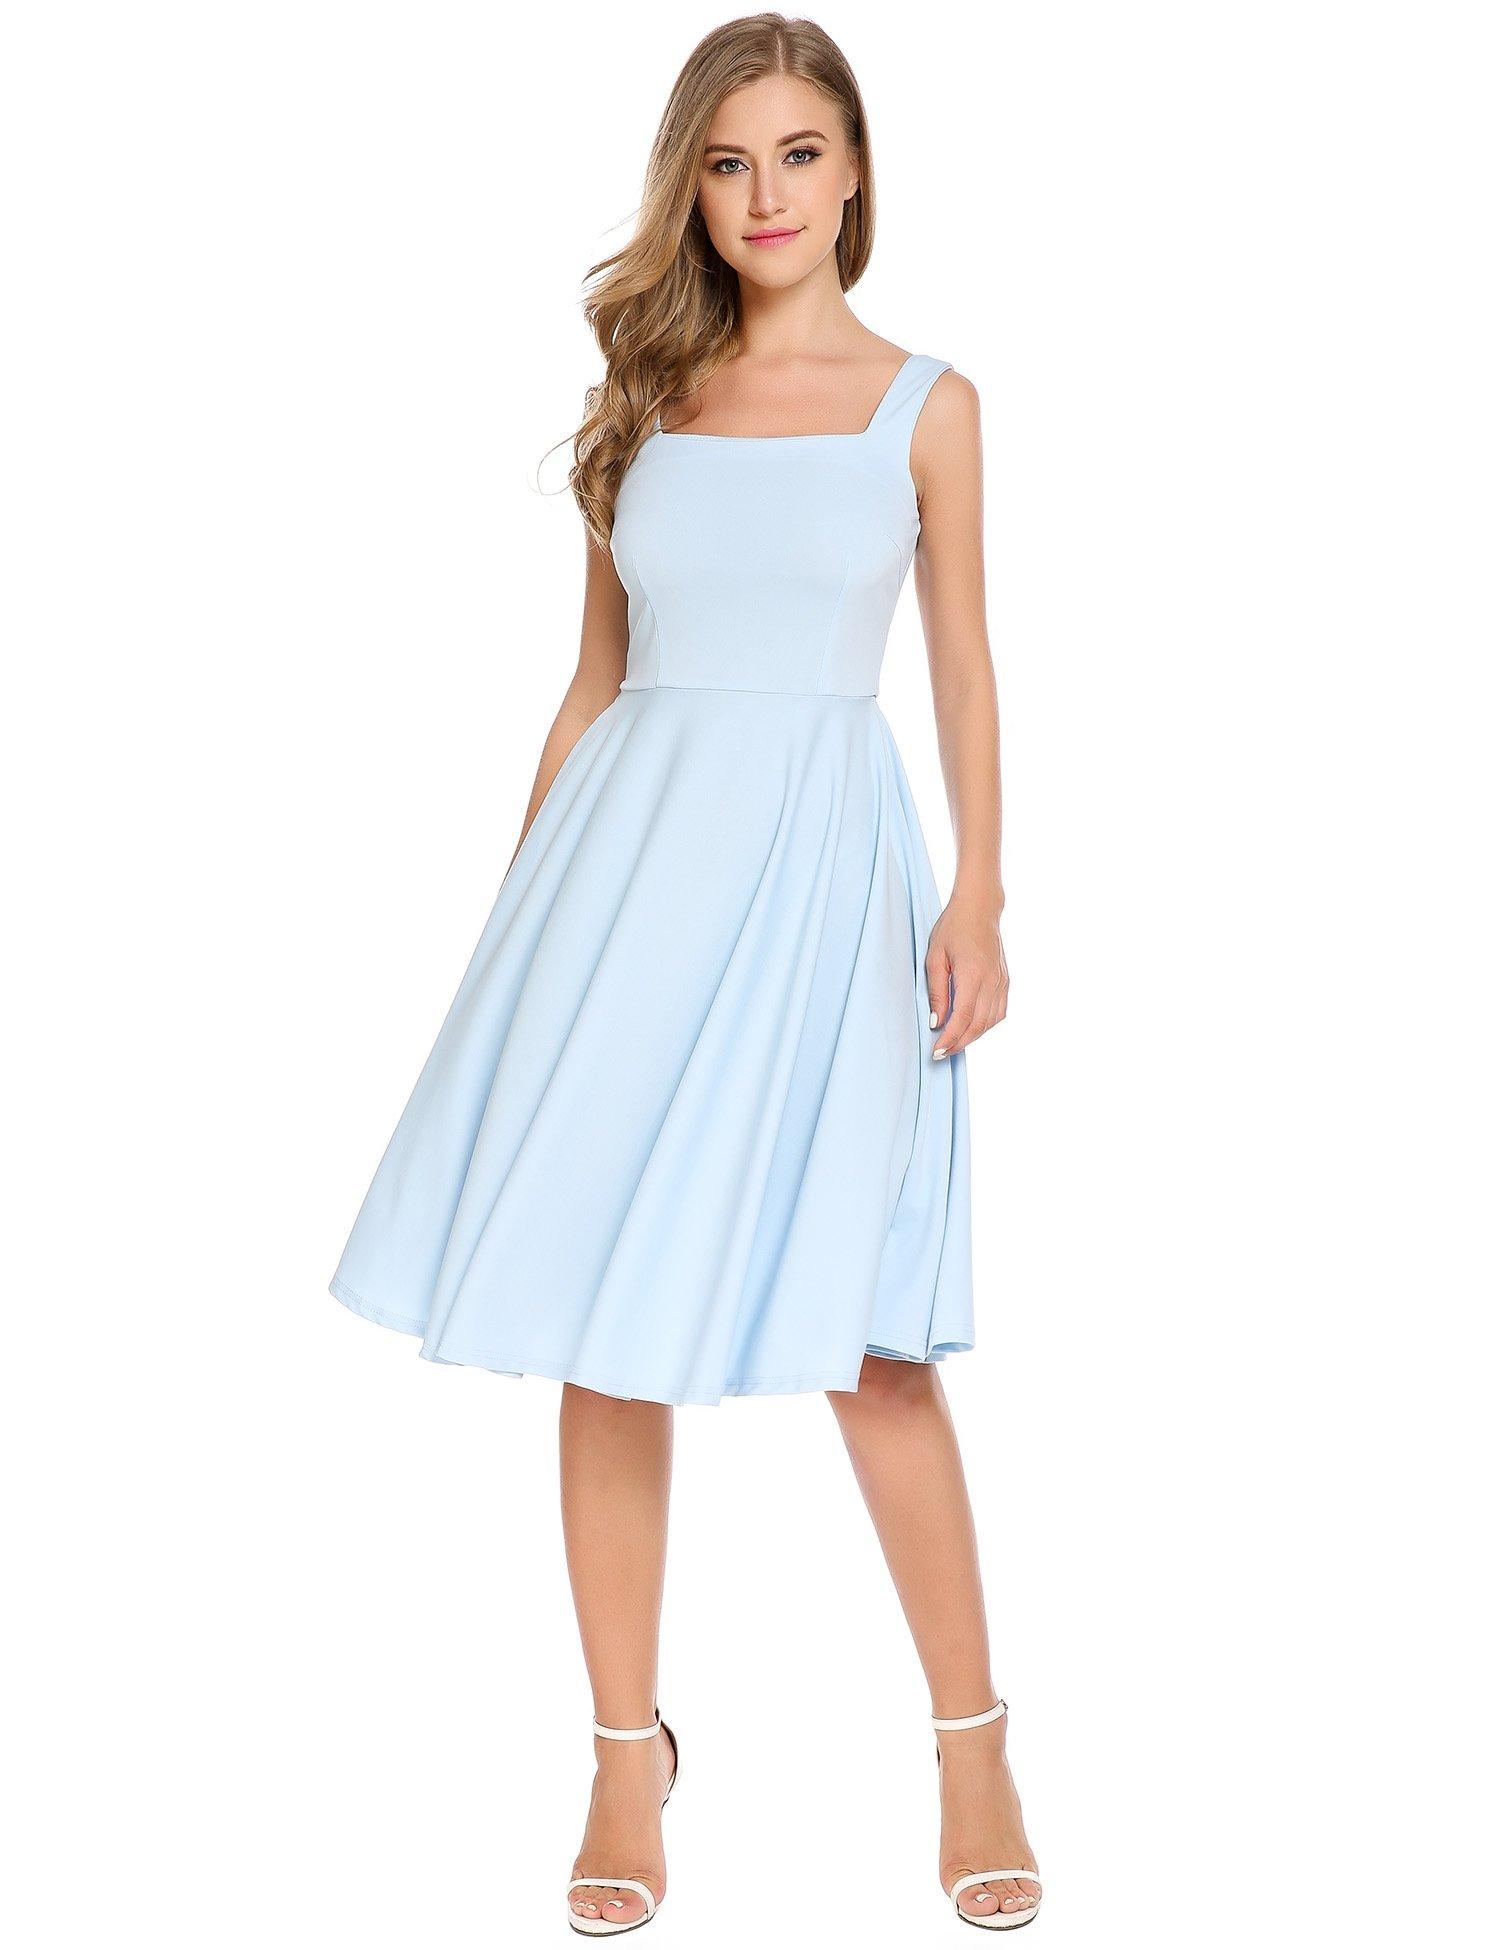 Zeagoo Women Casual Sleeveless Backless Tea Length Pleated Swing Dress